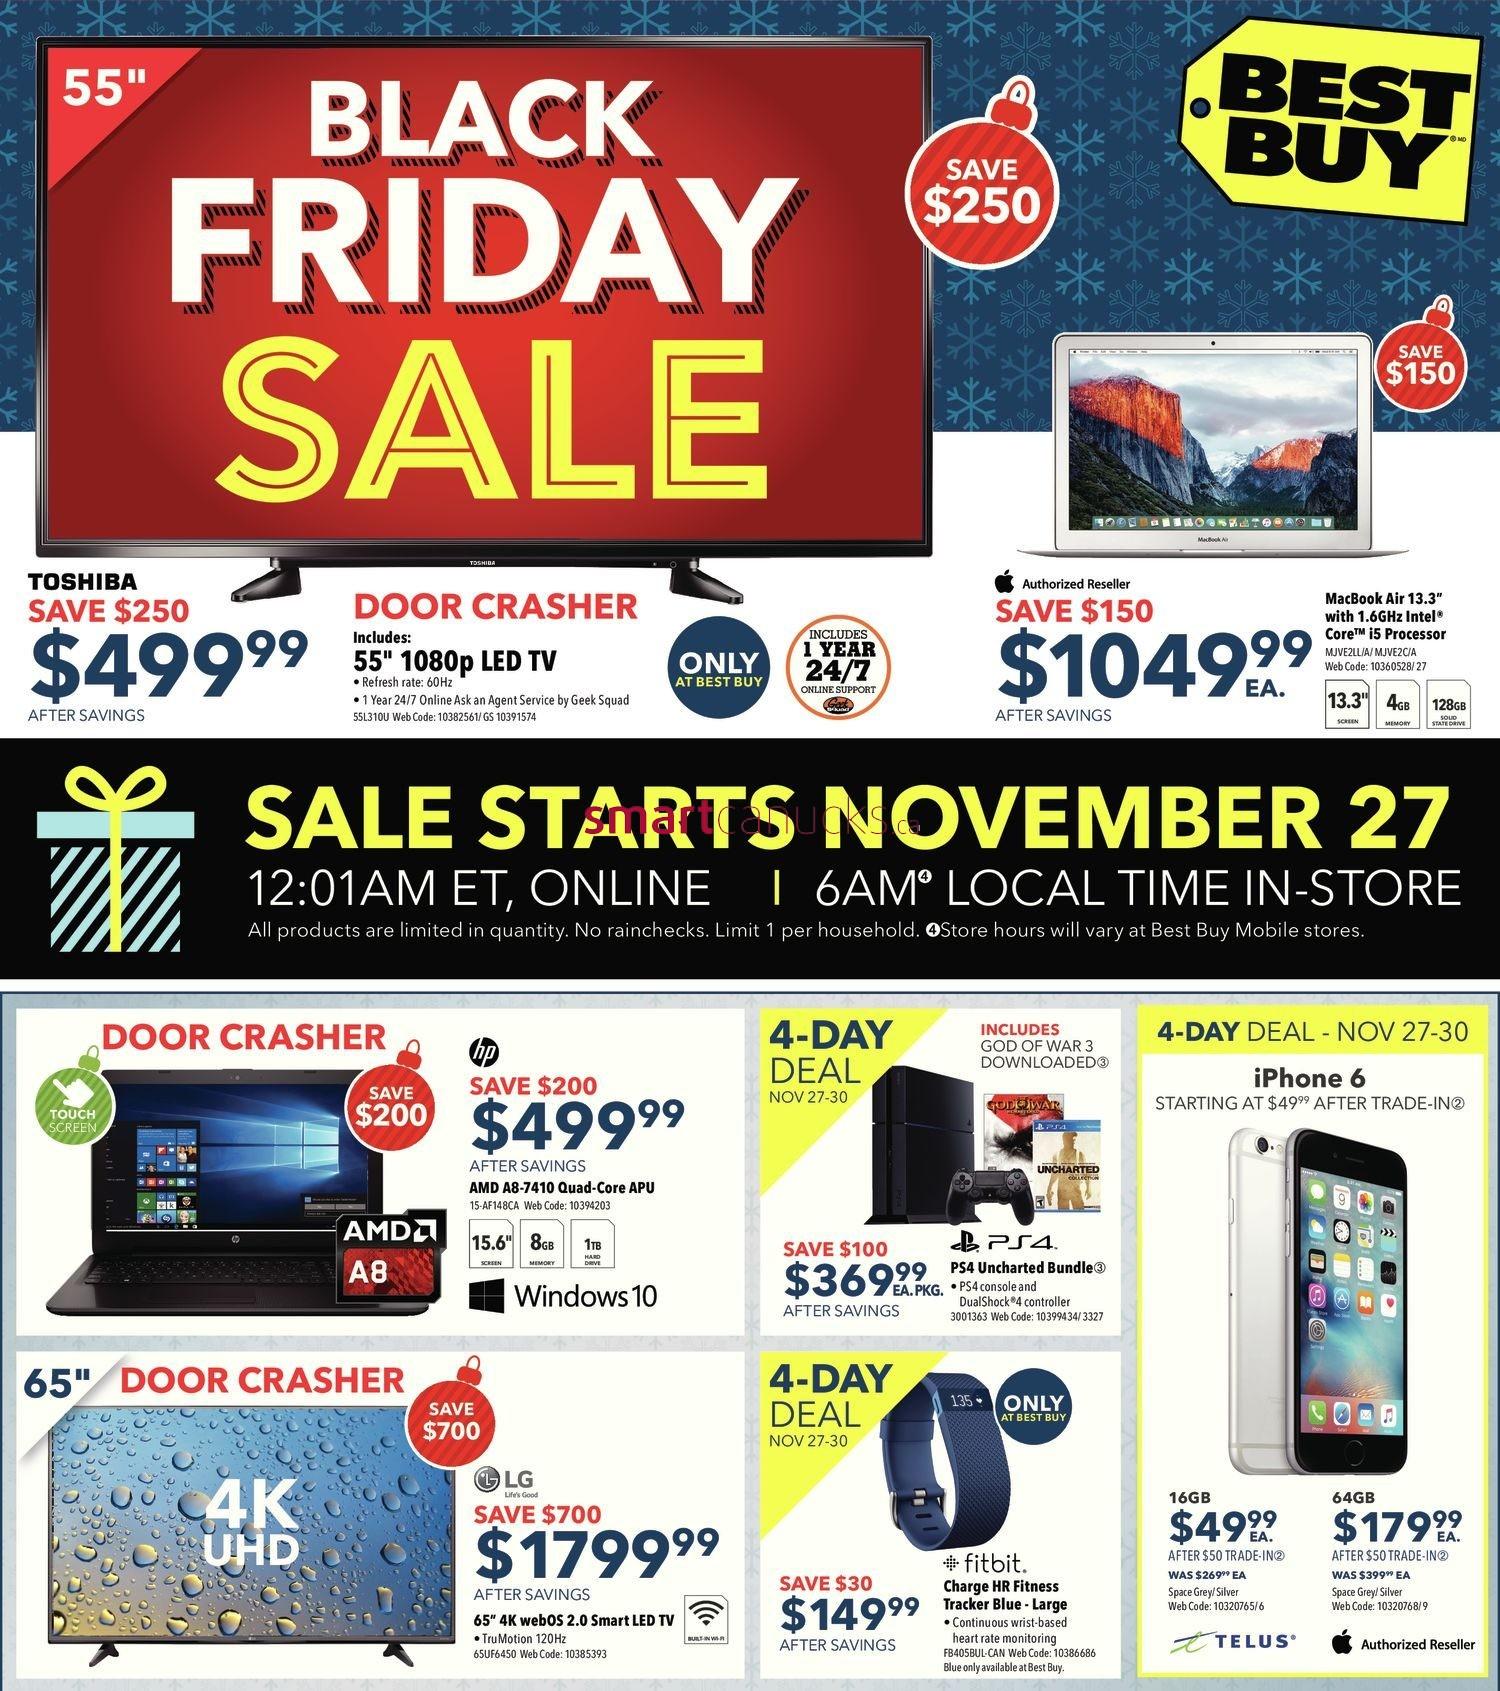 Best buy store deals black friday